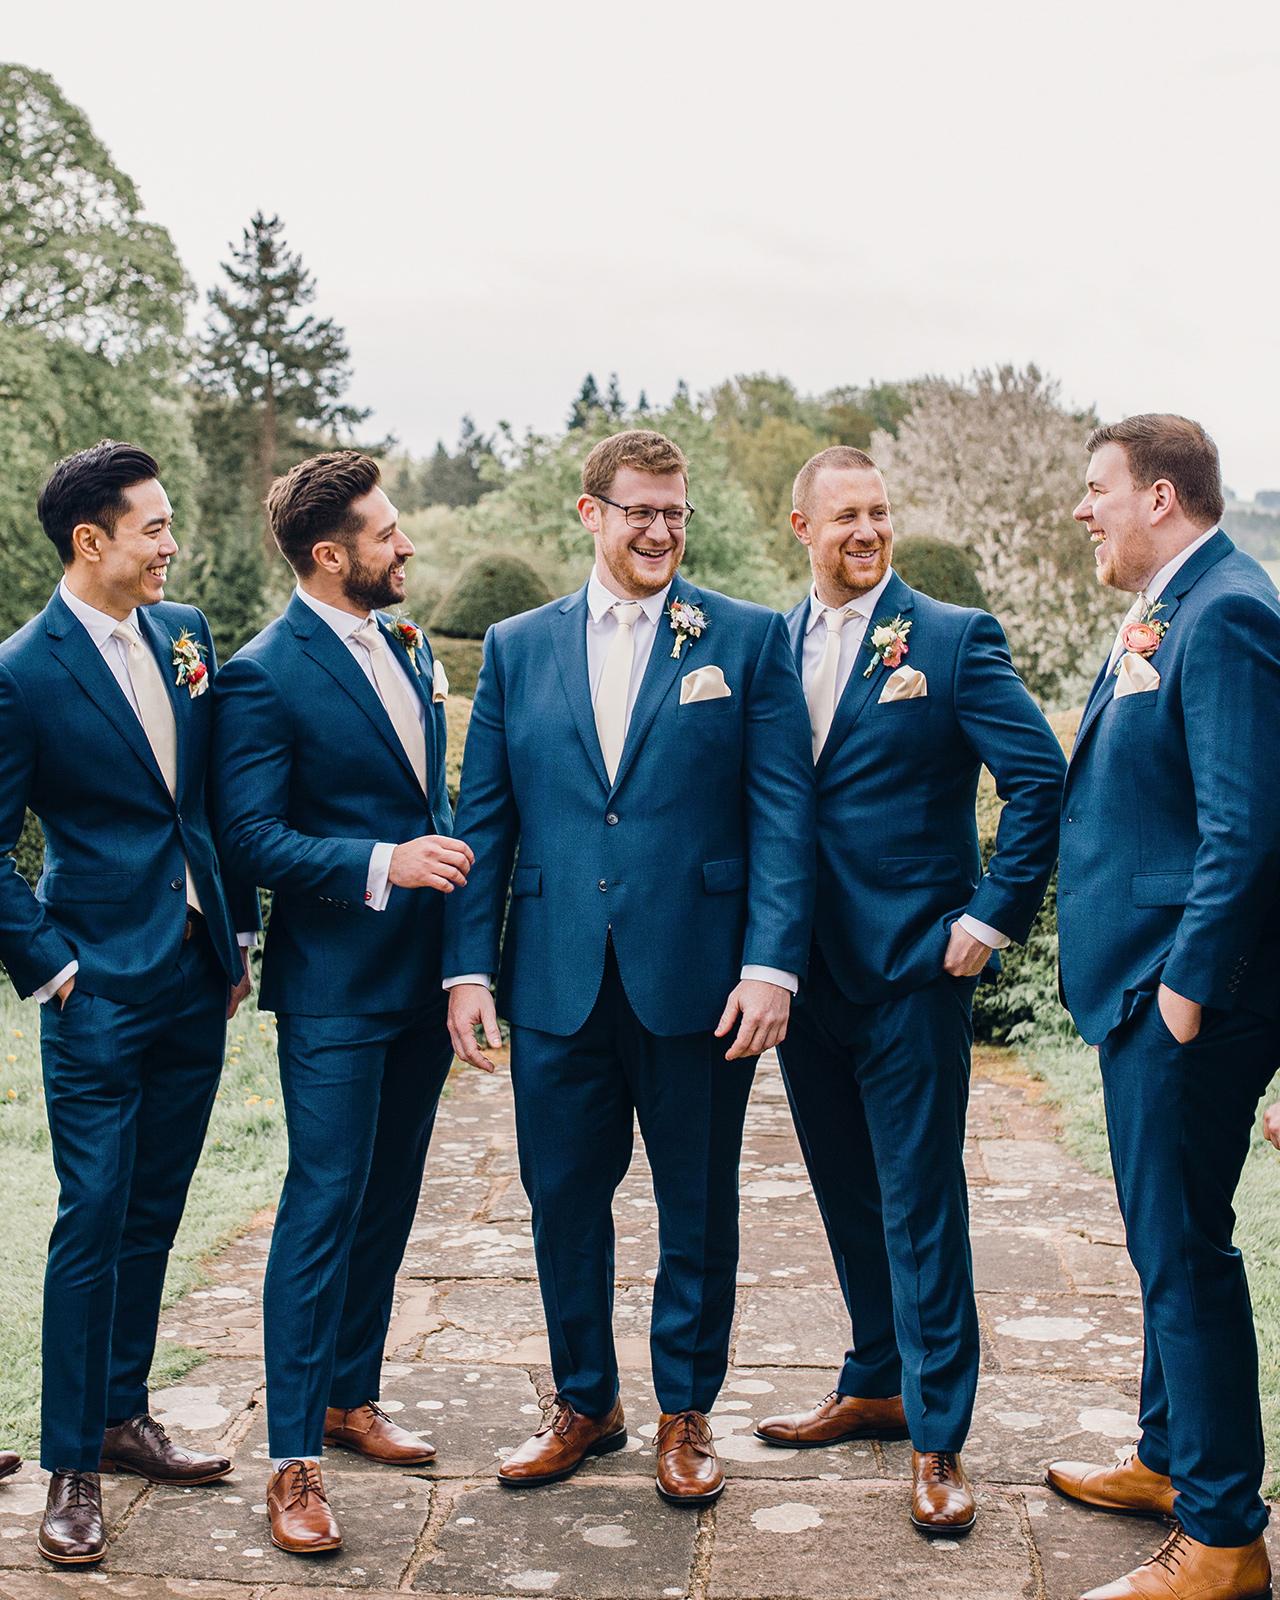 groom with groomsmen in navy blue attire outdoors